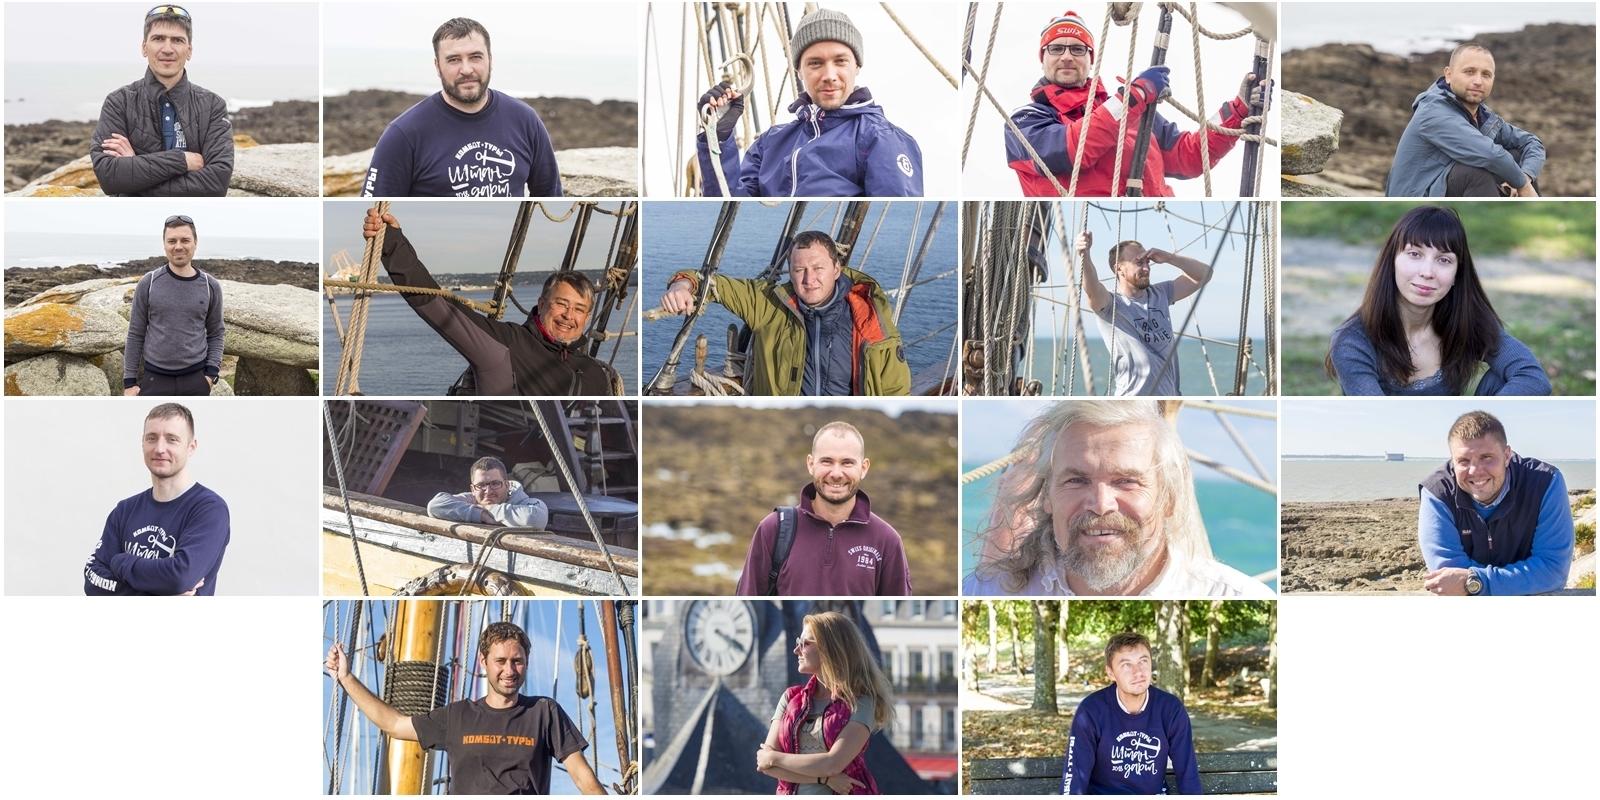 Счастливые лица экипажа комбат-тура на фрегате Штандарт